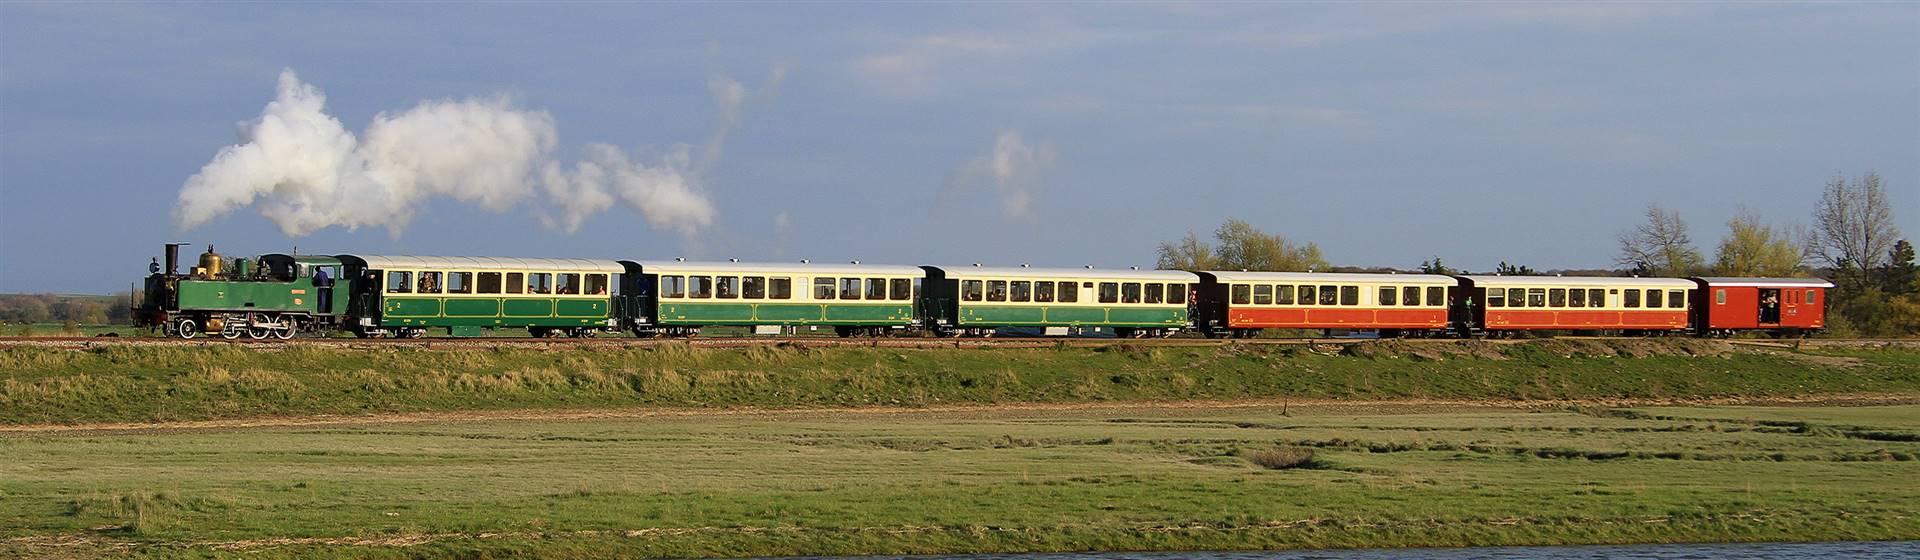 "<img src=""baiedesommepassengerandlake.jpeg"" alt=""Baie De Somme Passenger Train""/>"